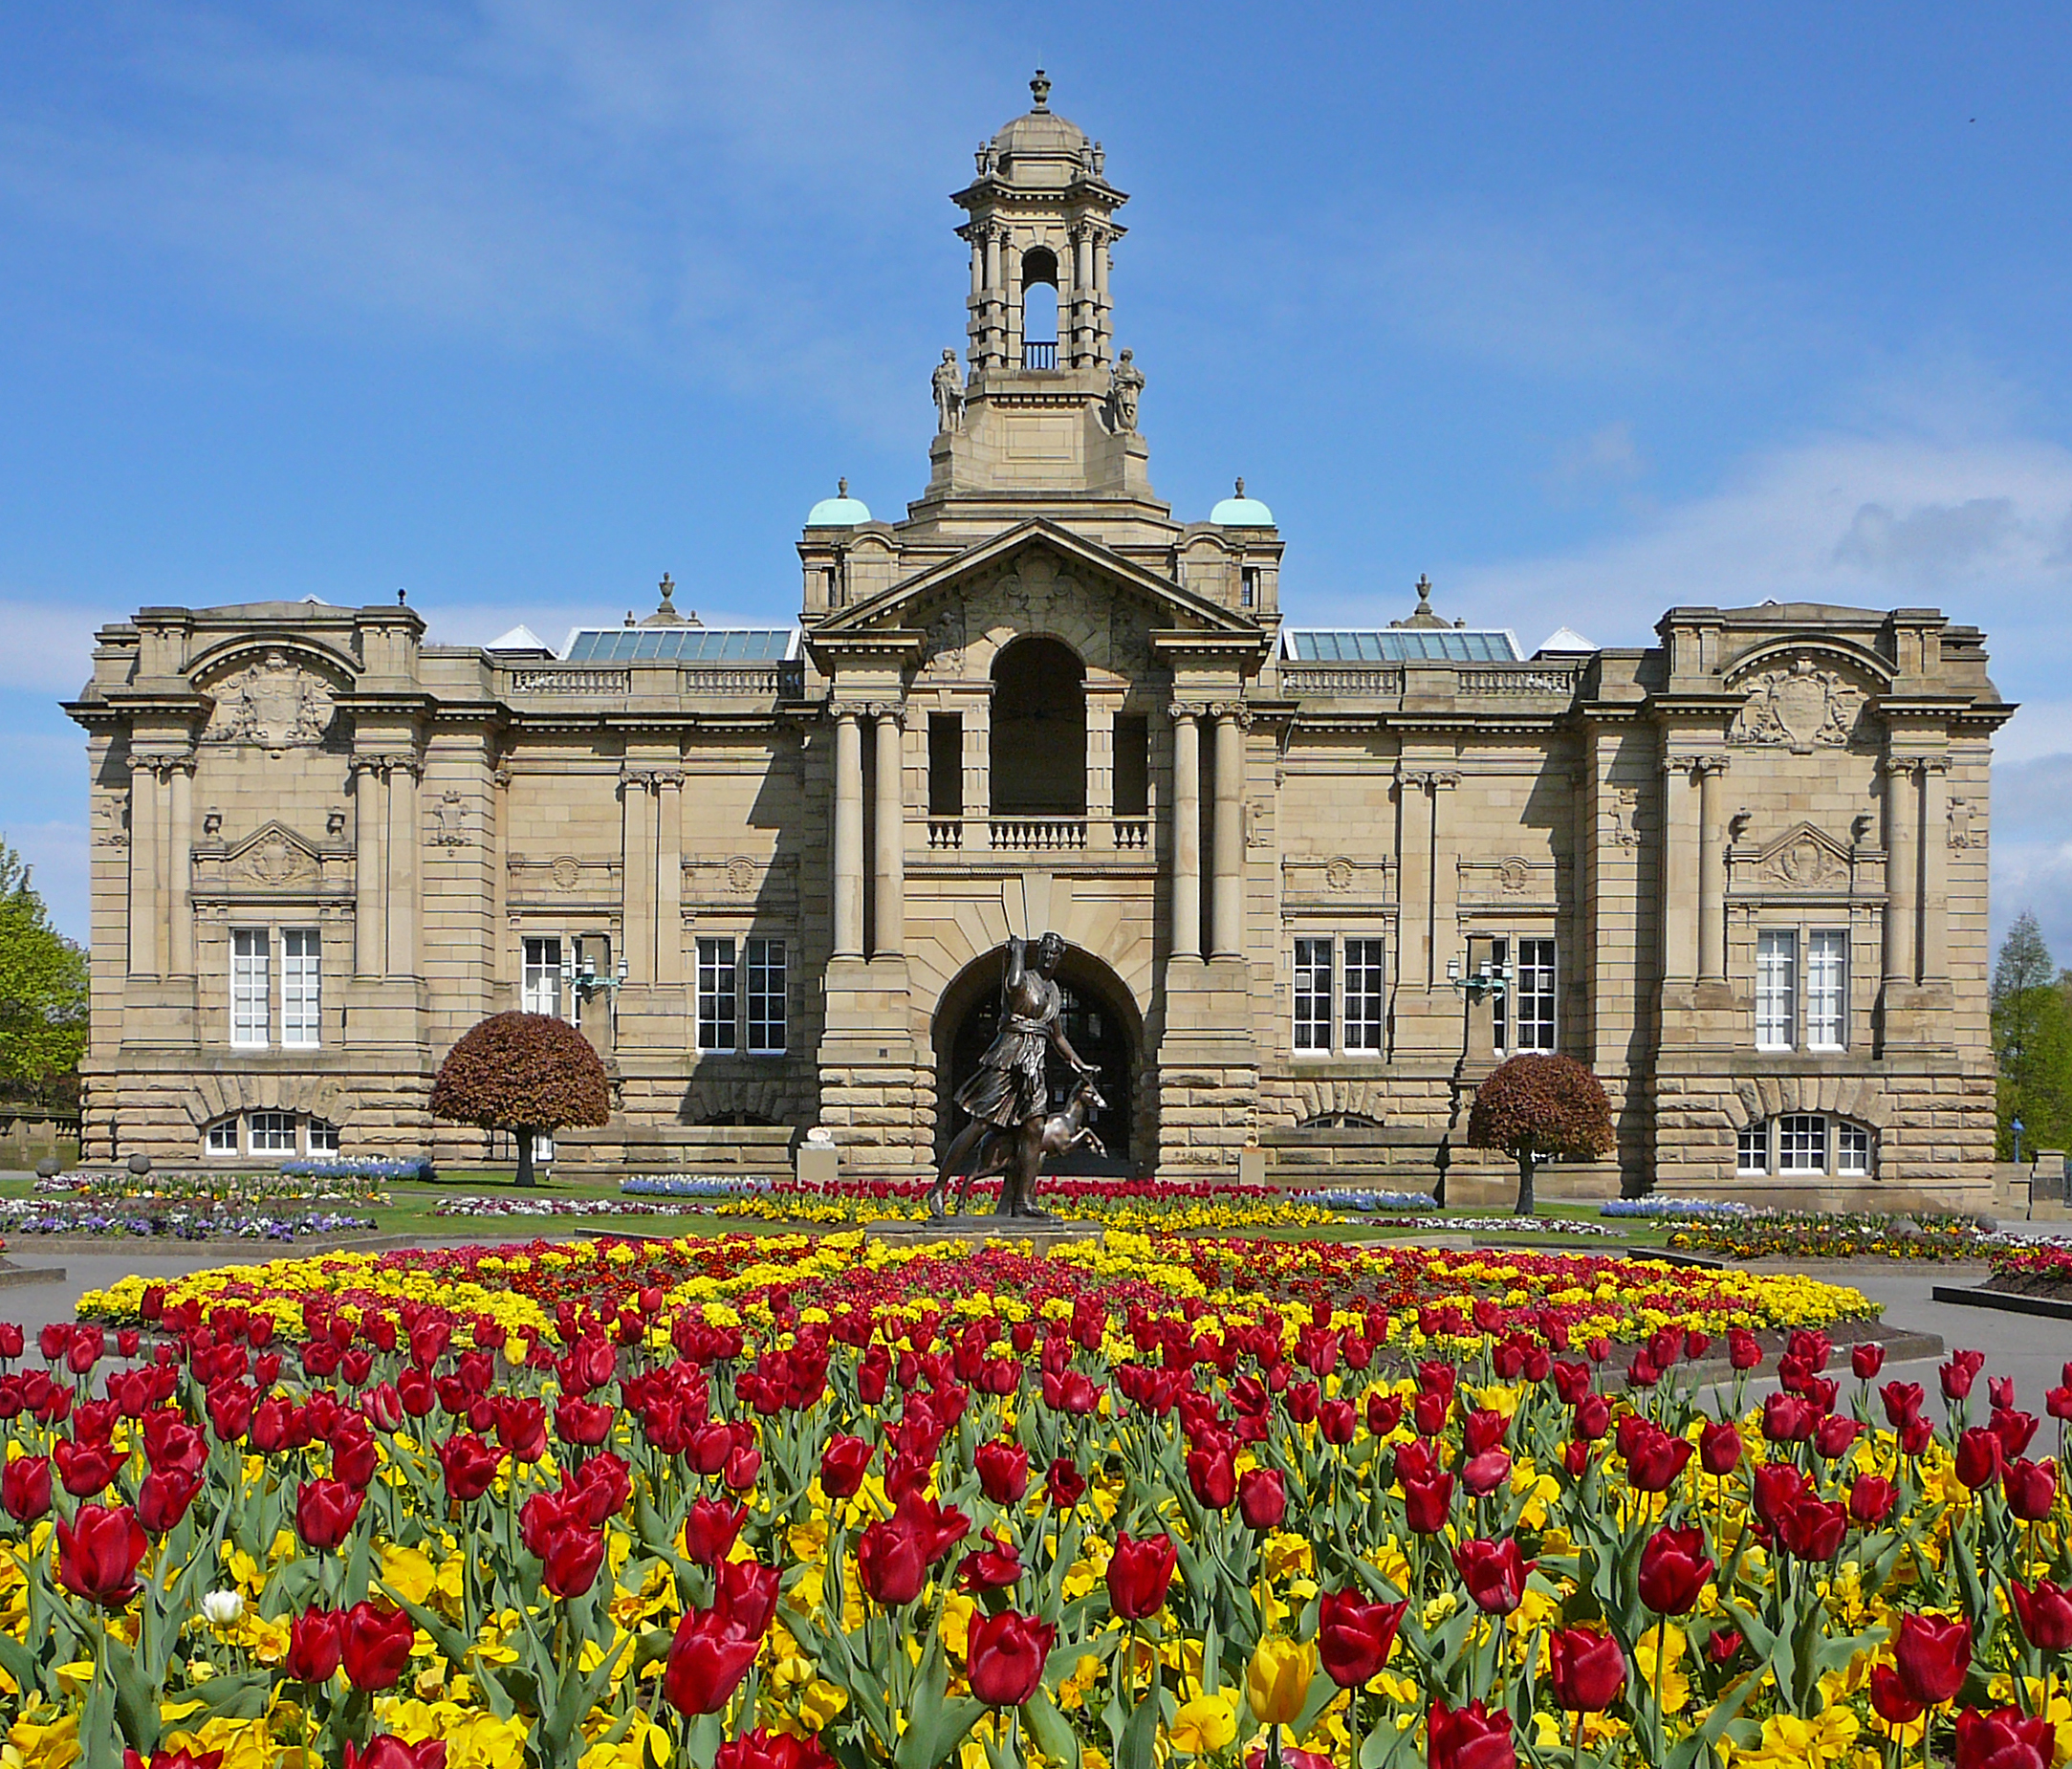 Bradford United Kingdom  city photos gallery : Informations about Bradford United Kingdom